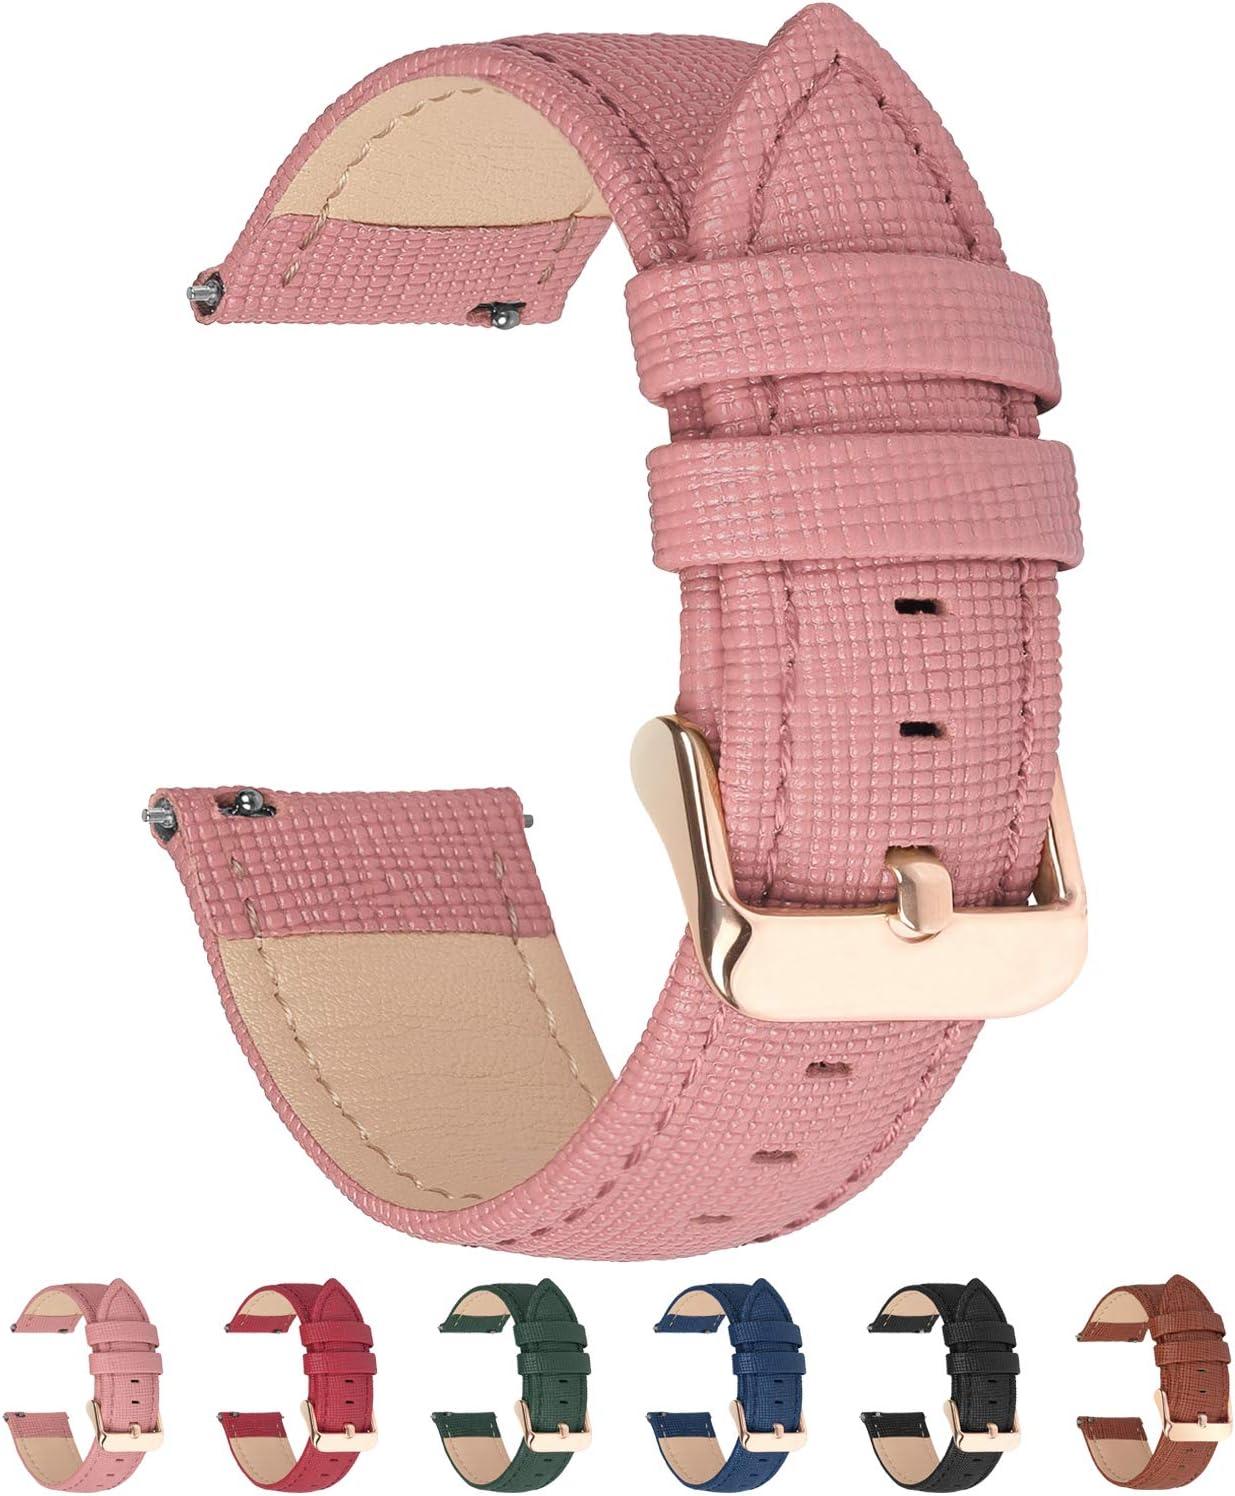 Fullmosa 6 Colores para Correa de Reloj, Cross Piel Correa Huawei Samsung Correa/Banda/Band/Pulsera/Strap de Recambio/Reemplazo 18mm 20mm 22mm 24mm,Rosada 18mm